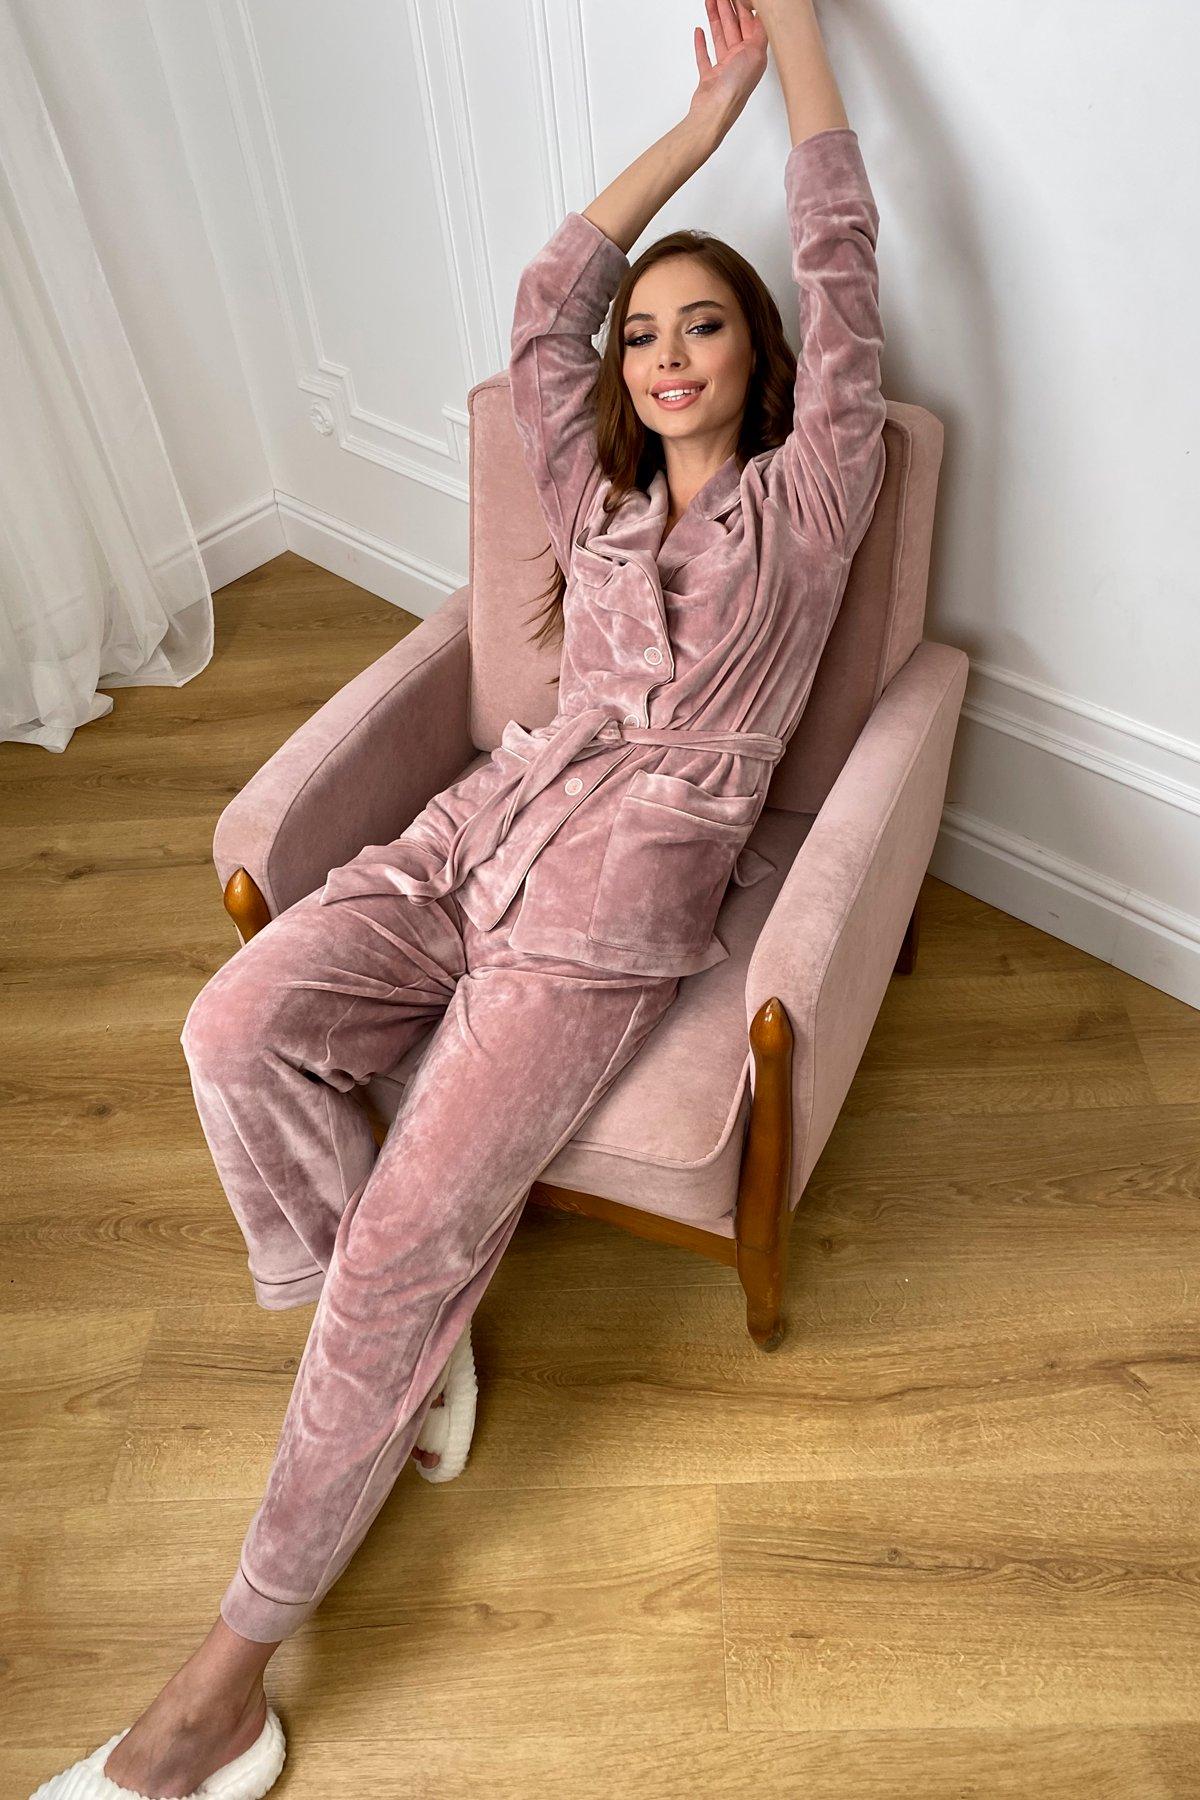 Шайн пижама велюр жакет брюки маска для сна 10353 АРТ. 46660 Цвет: Пудра - фото 3, интернет магазин tm-modus.ru